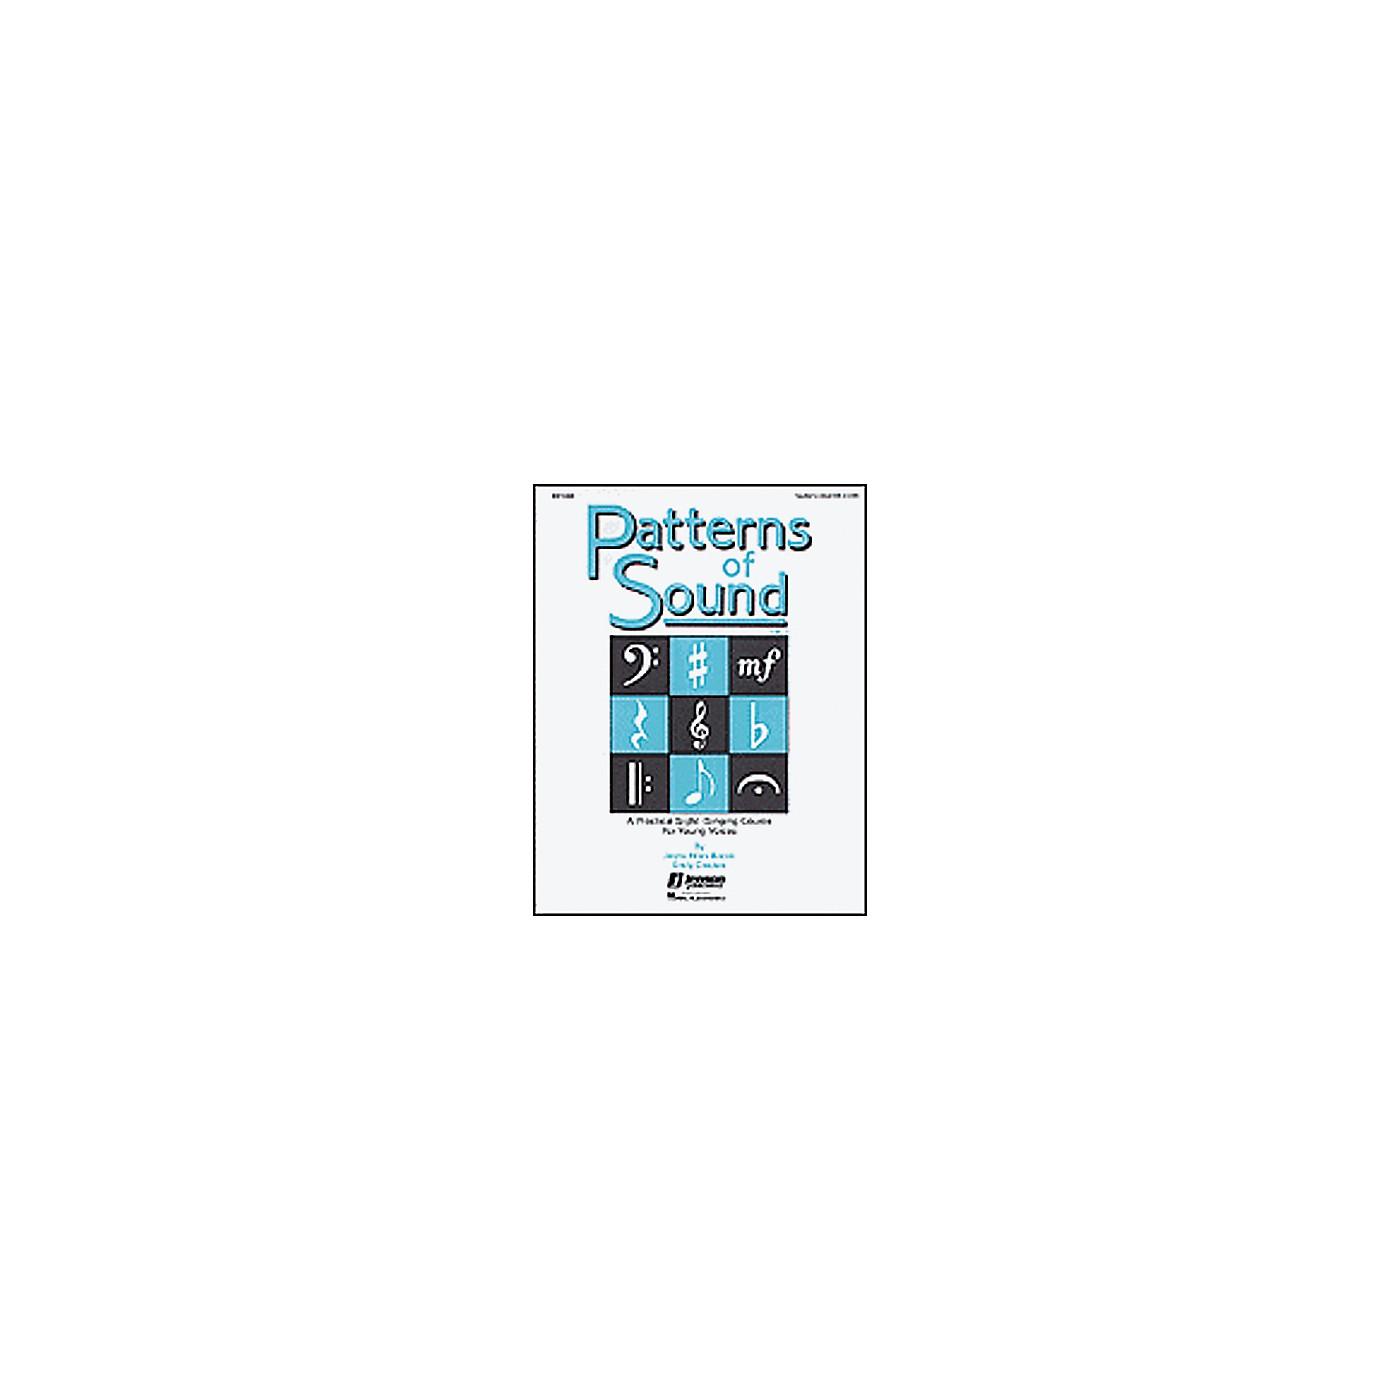 Hal Leonard Patterns of Sound Teacher's Edition - Volume 1 Book thumbnail